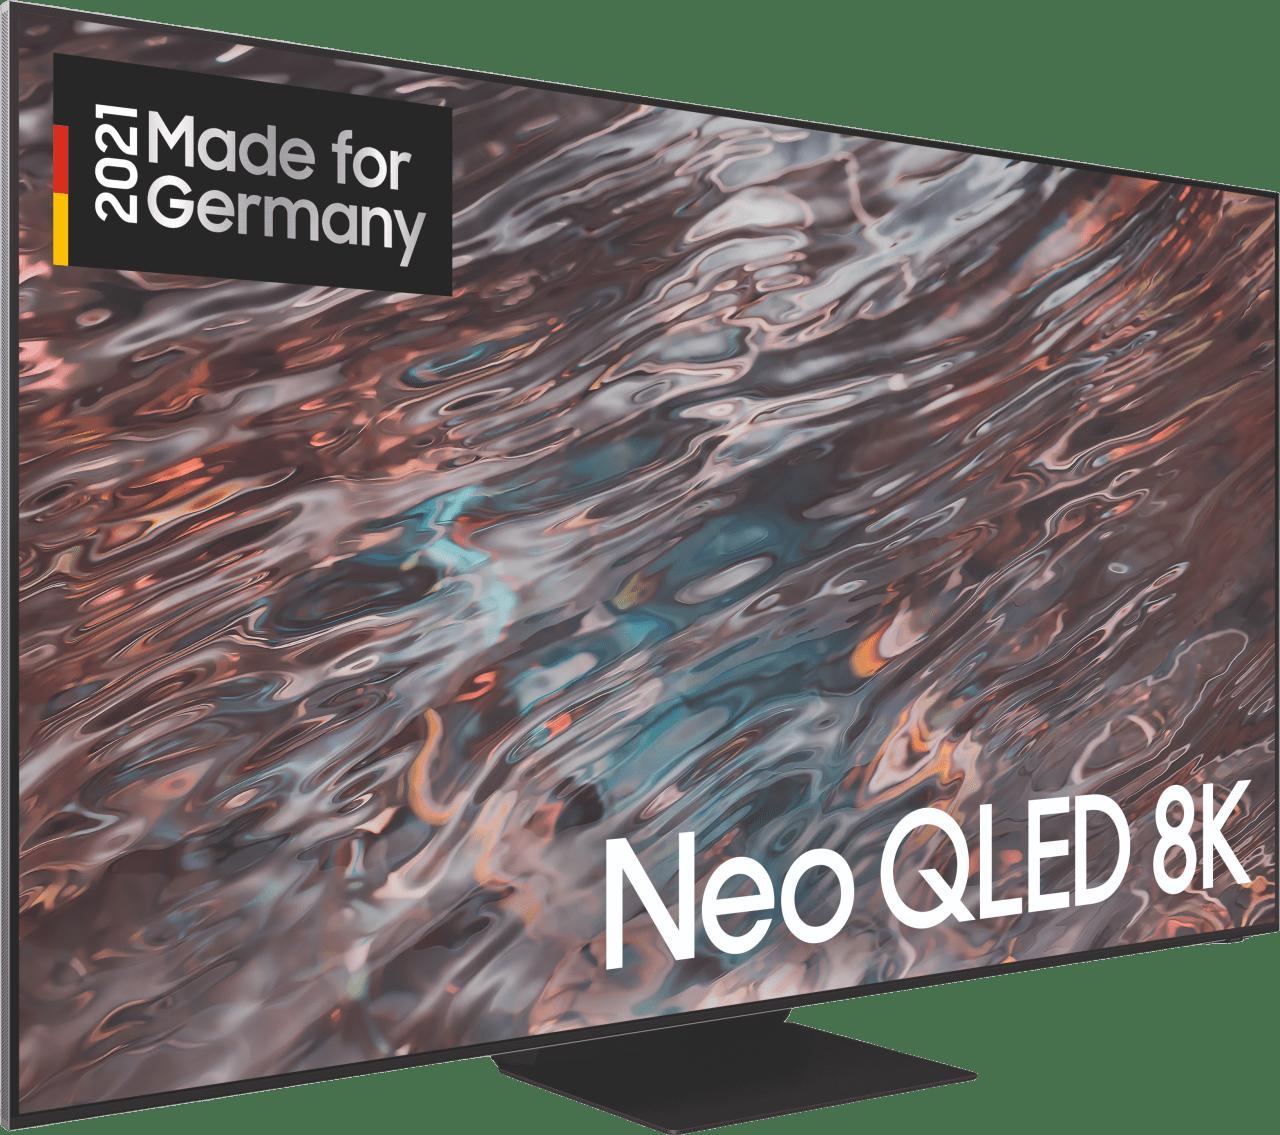 "Black Samsung TV 65"" GQ65QN800ATXZG Neo QLED 8K.2"